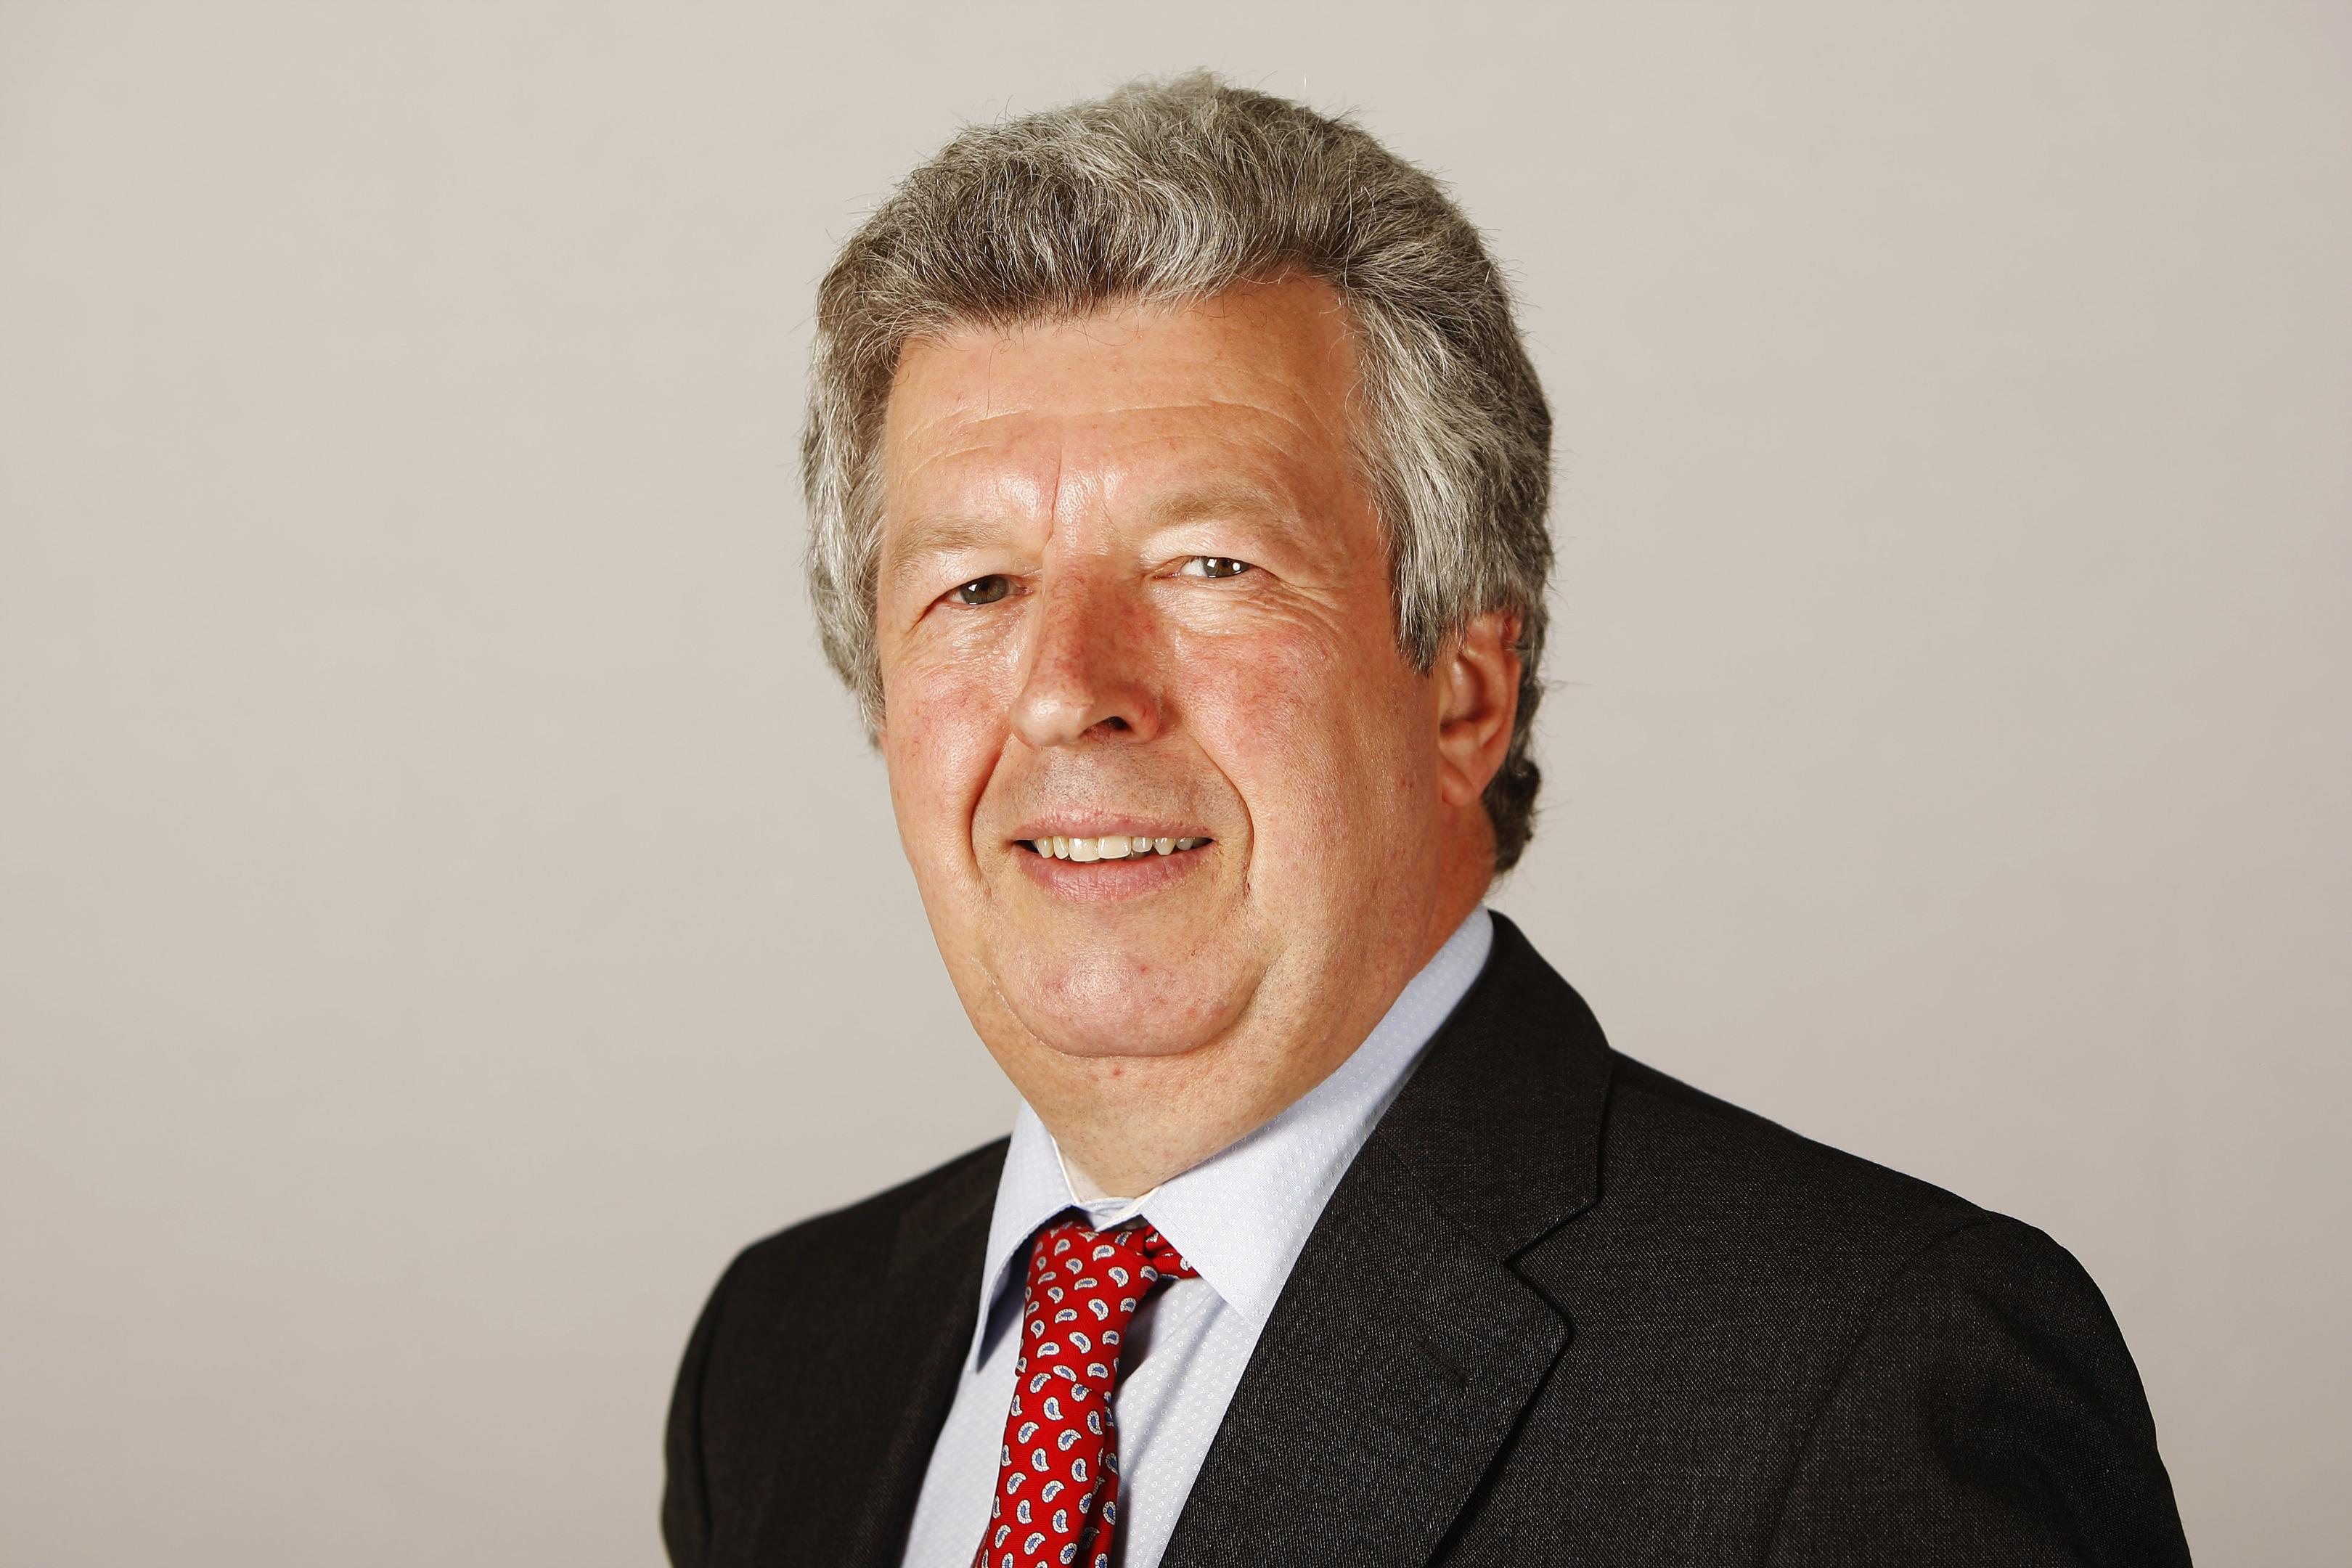 Lewis Macdonald MSP.